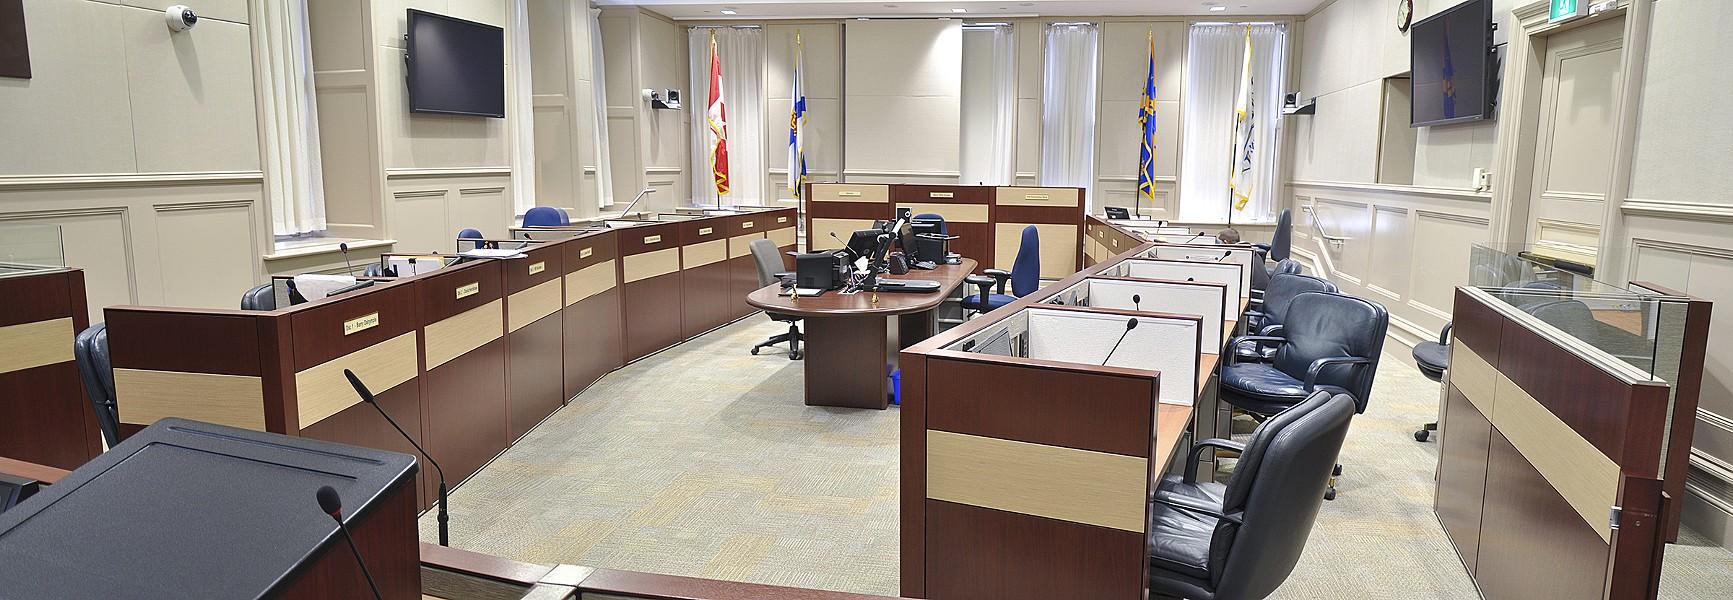 Council meets Tuesday, November 8 at 1pm inside City Hall. - VIA HRM